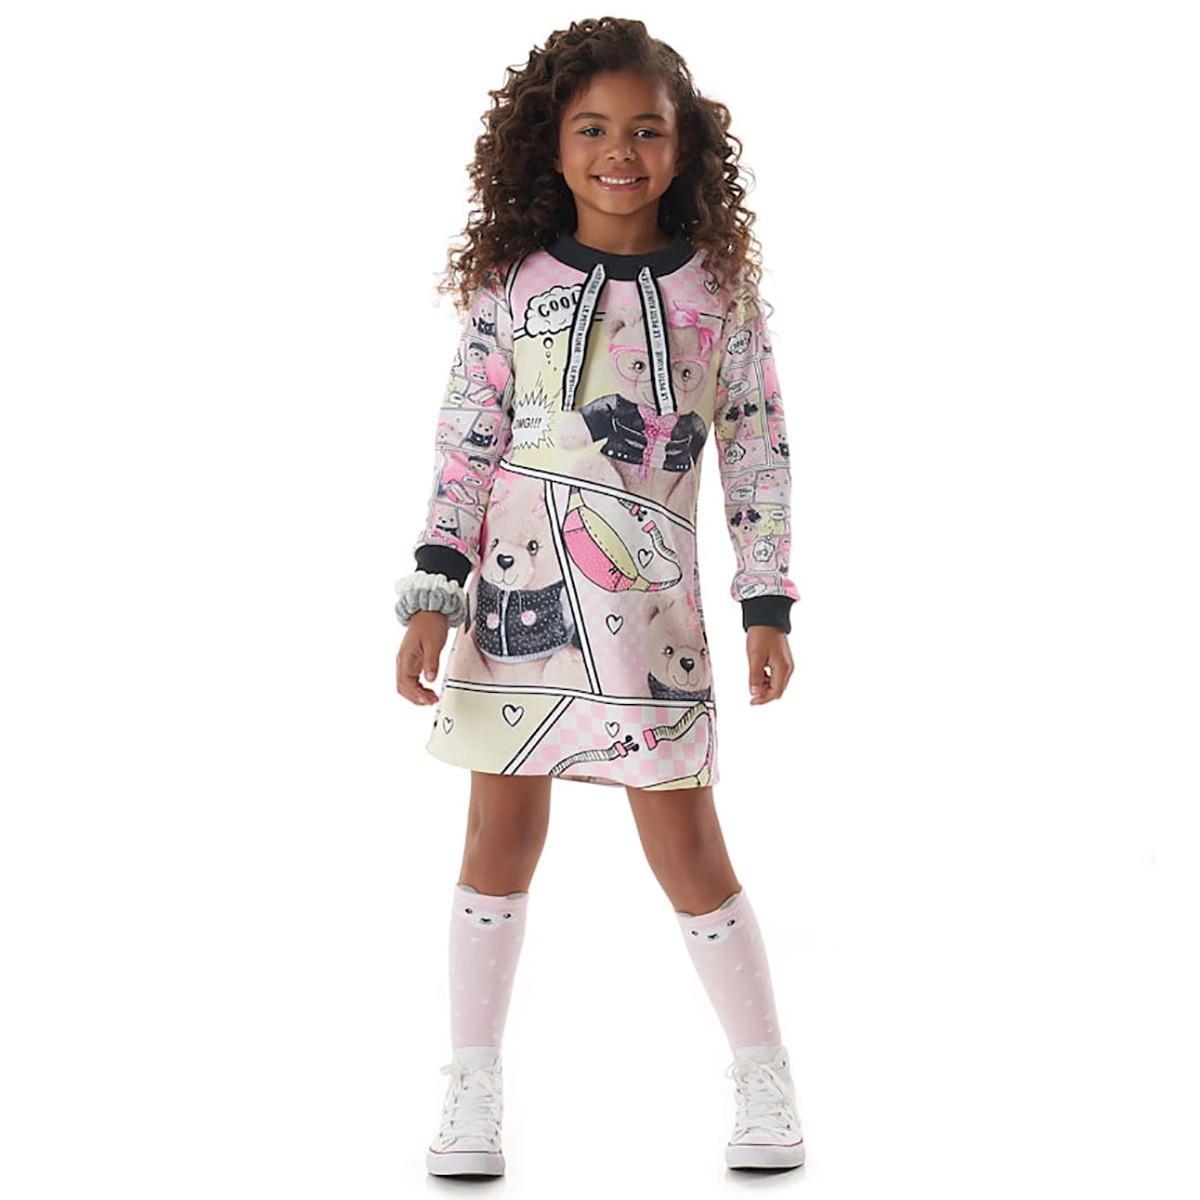 Vestido Kukie Feminino Infantil Ursinhos Quadrinhos